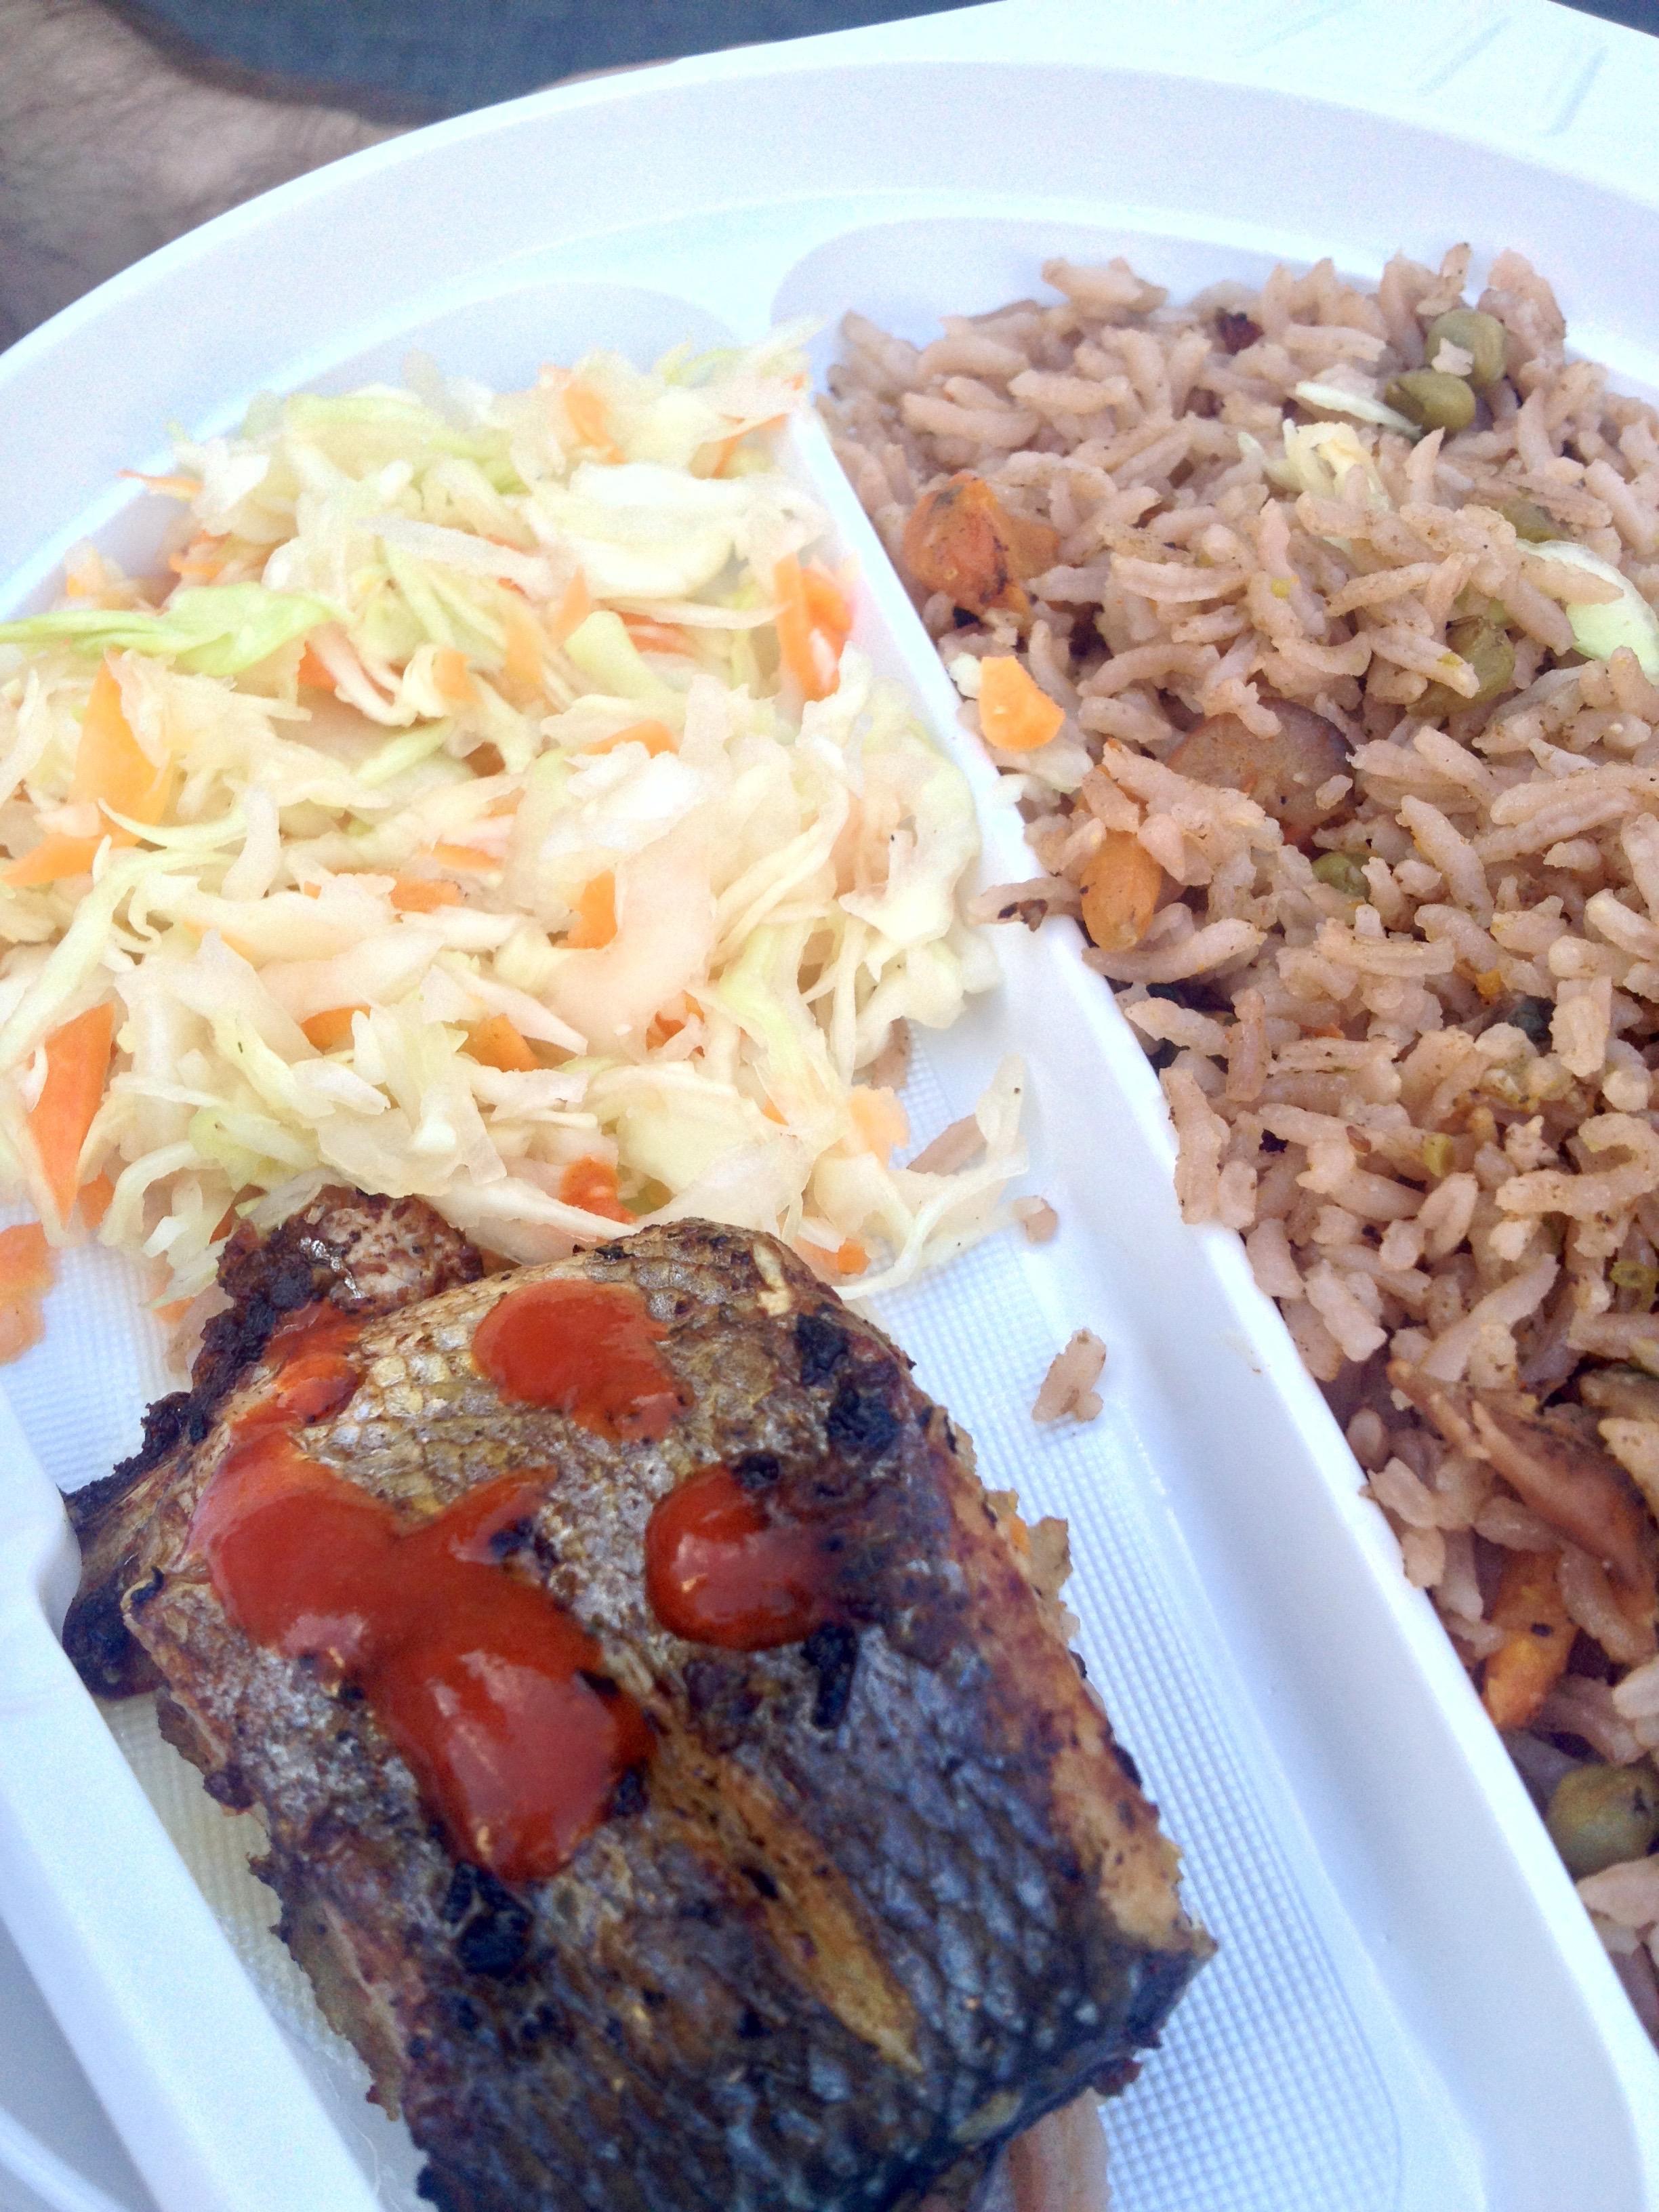 Fish, slaw, and rice from Haiti